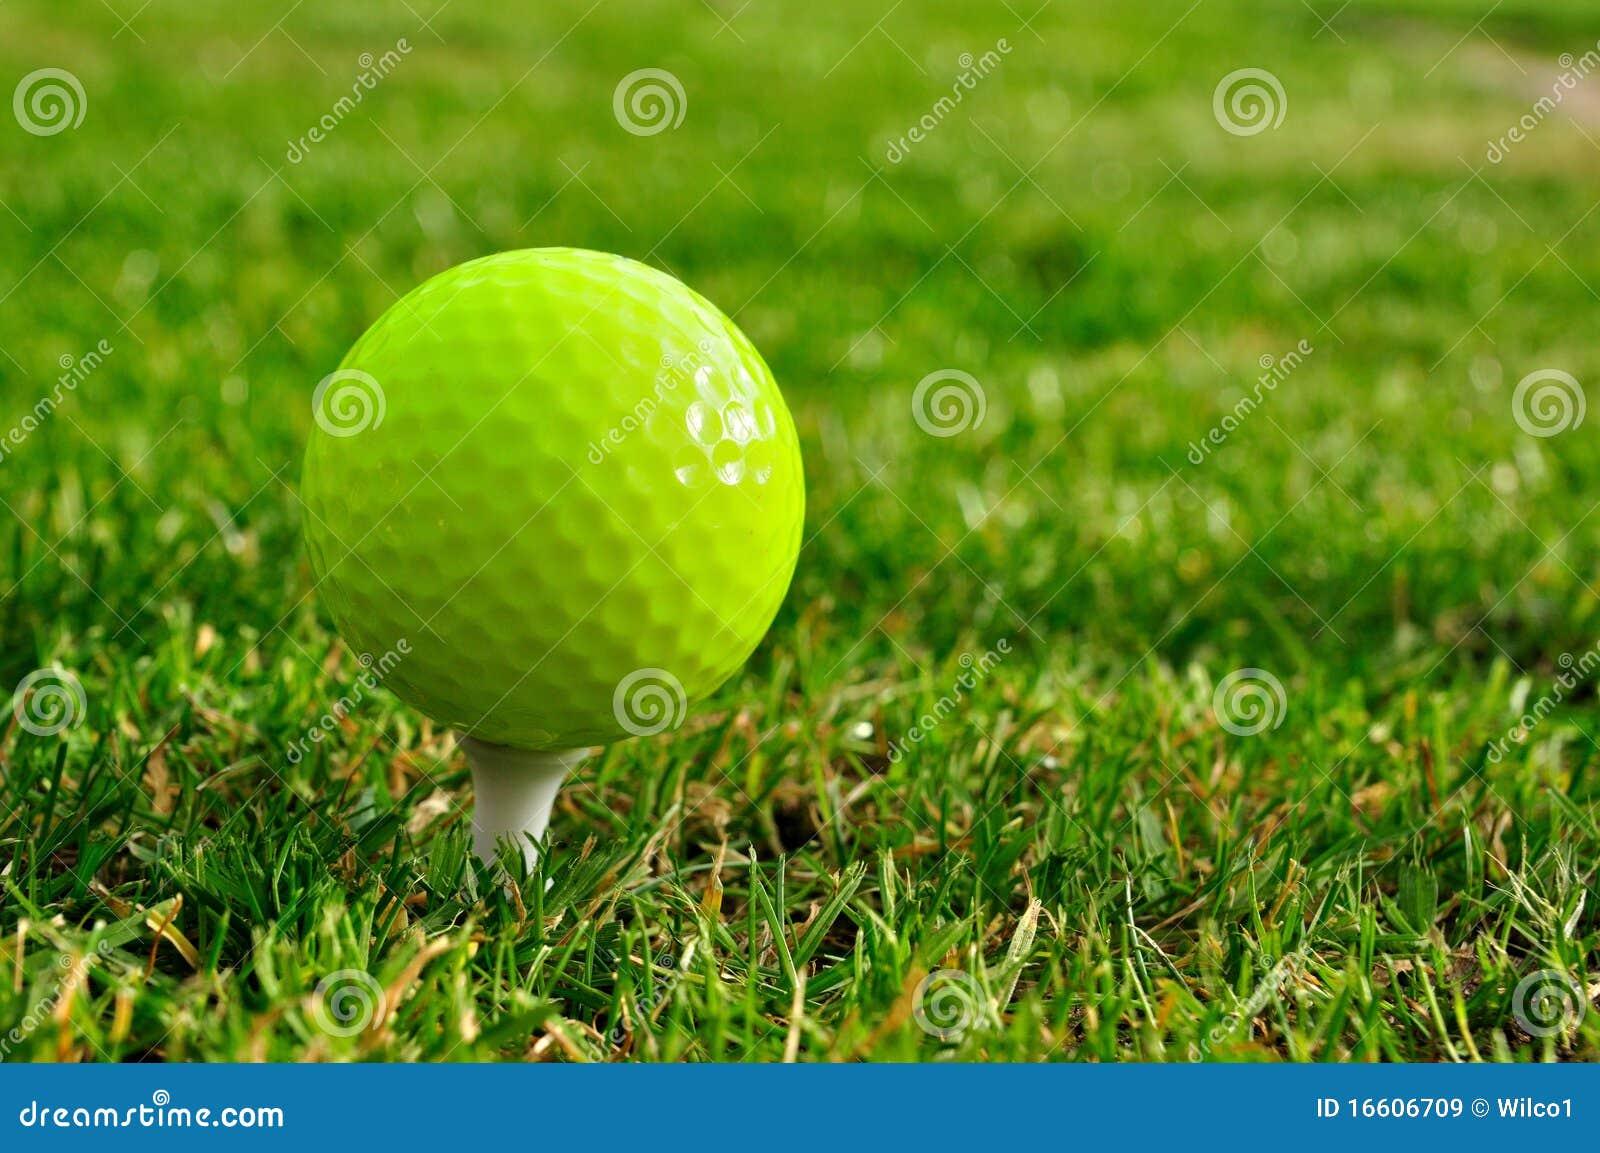 balle de golf verte images libres de droits image 16606709. Black Bedroom Furniture Sets. Home Design Ideas